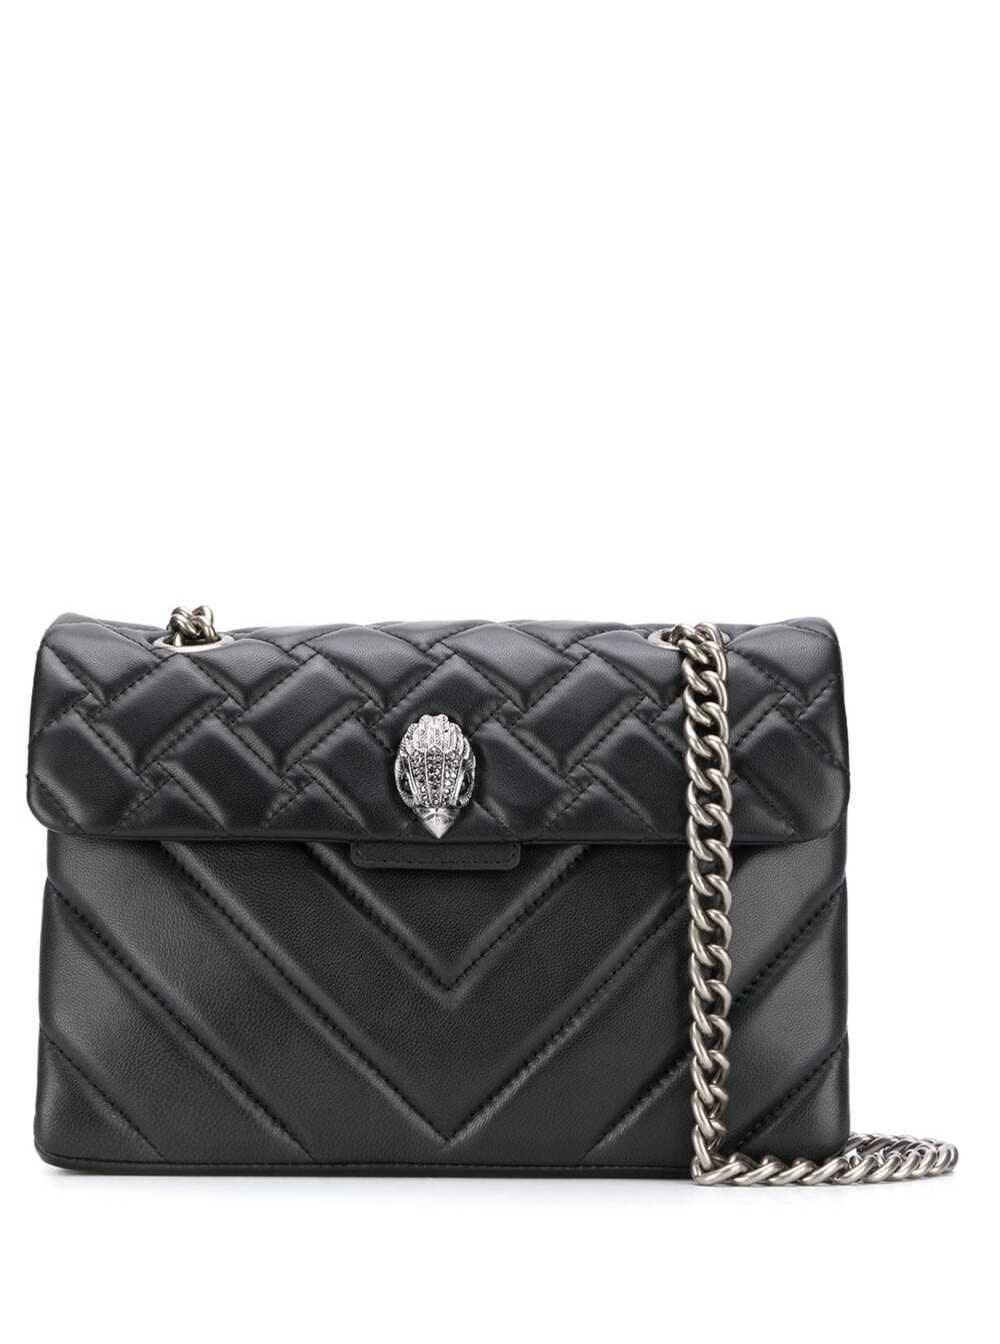 Leather Kensington X Bag Black/comb